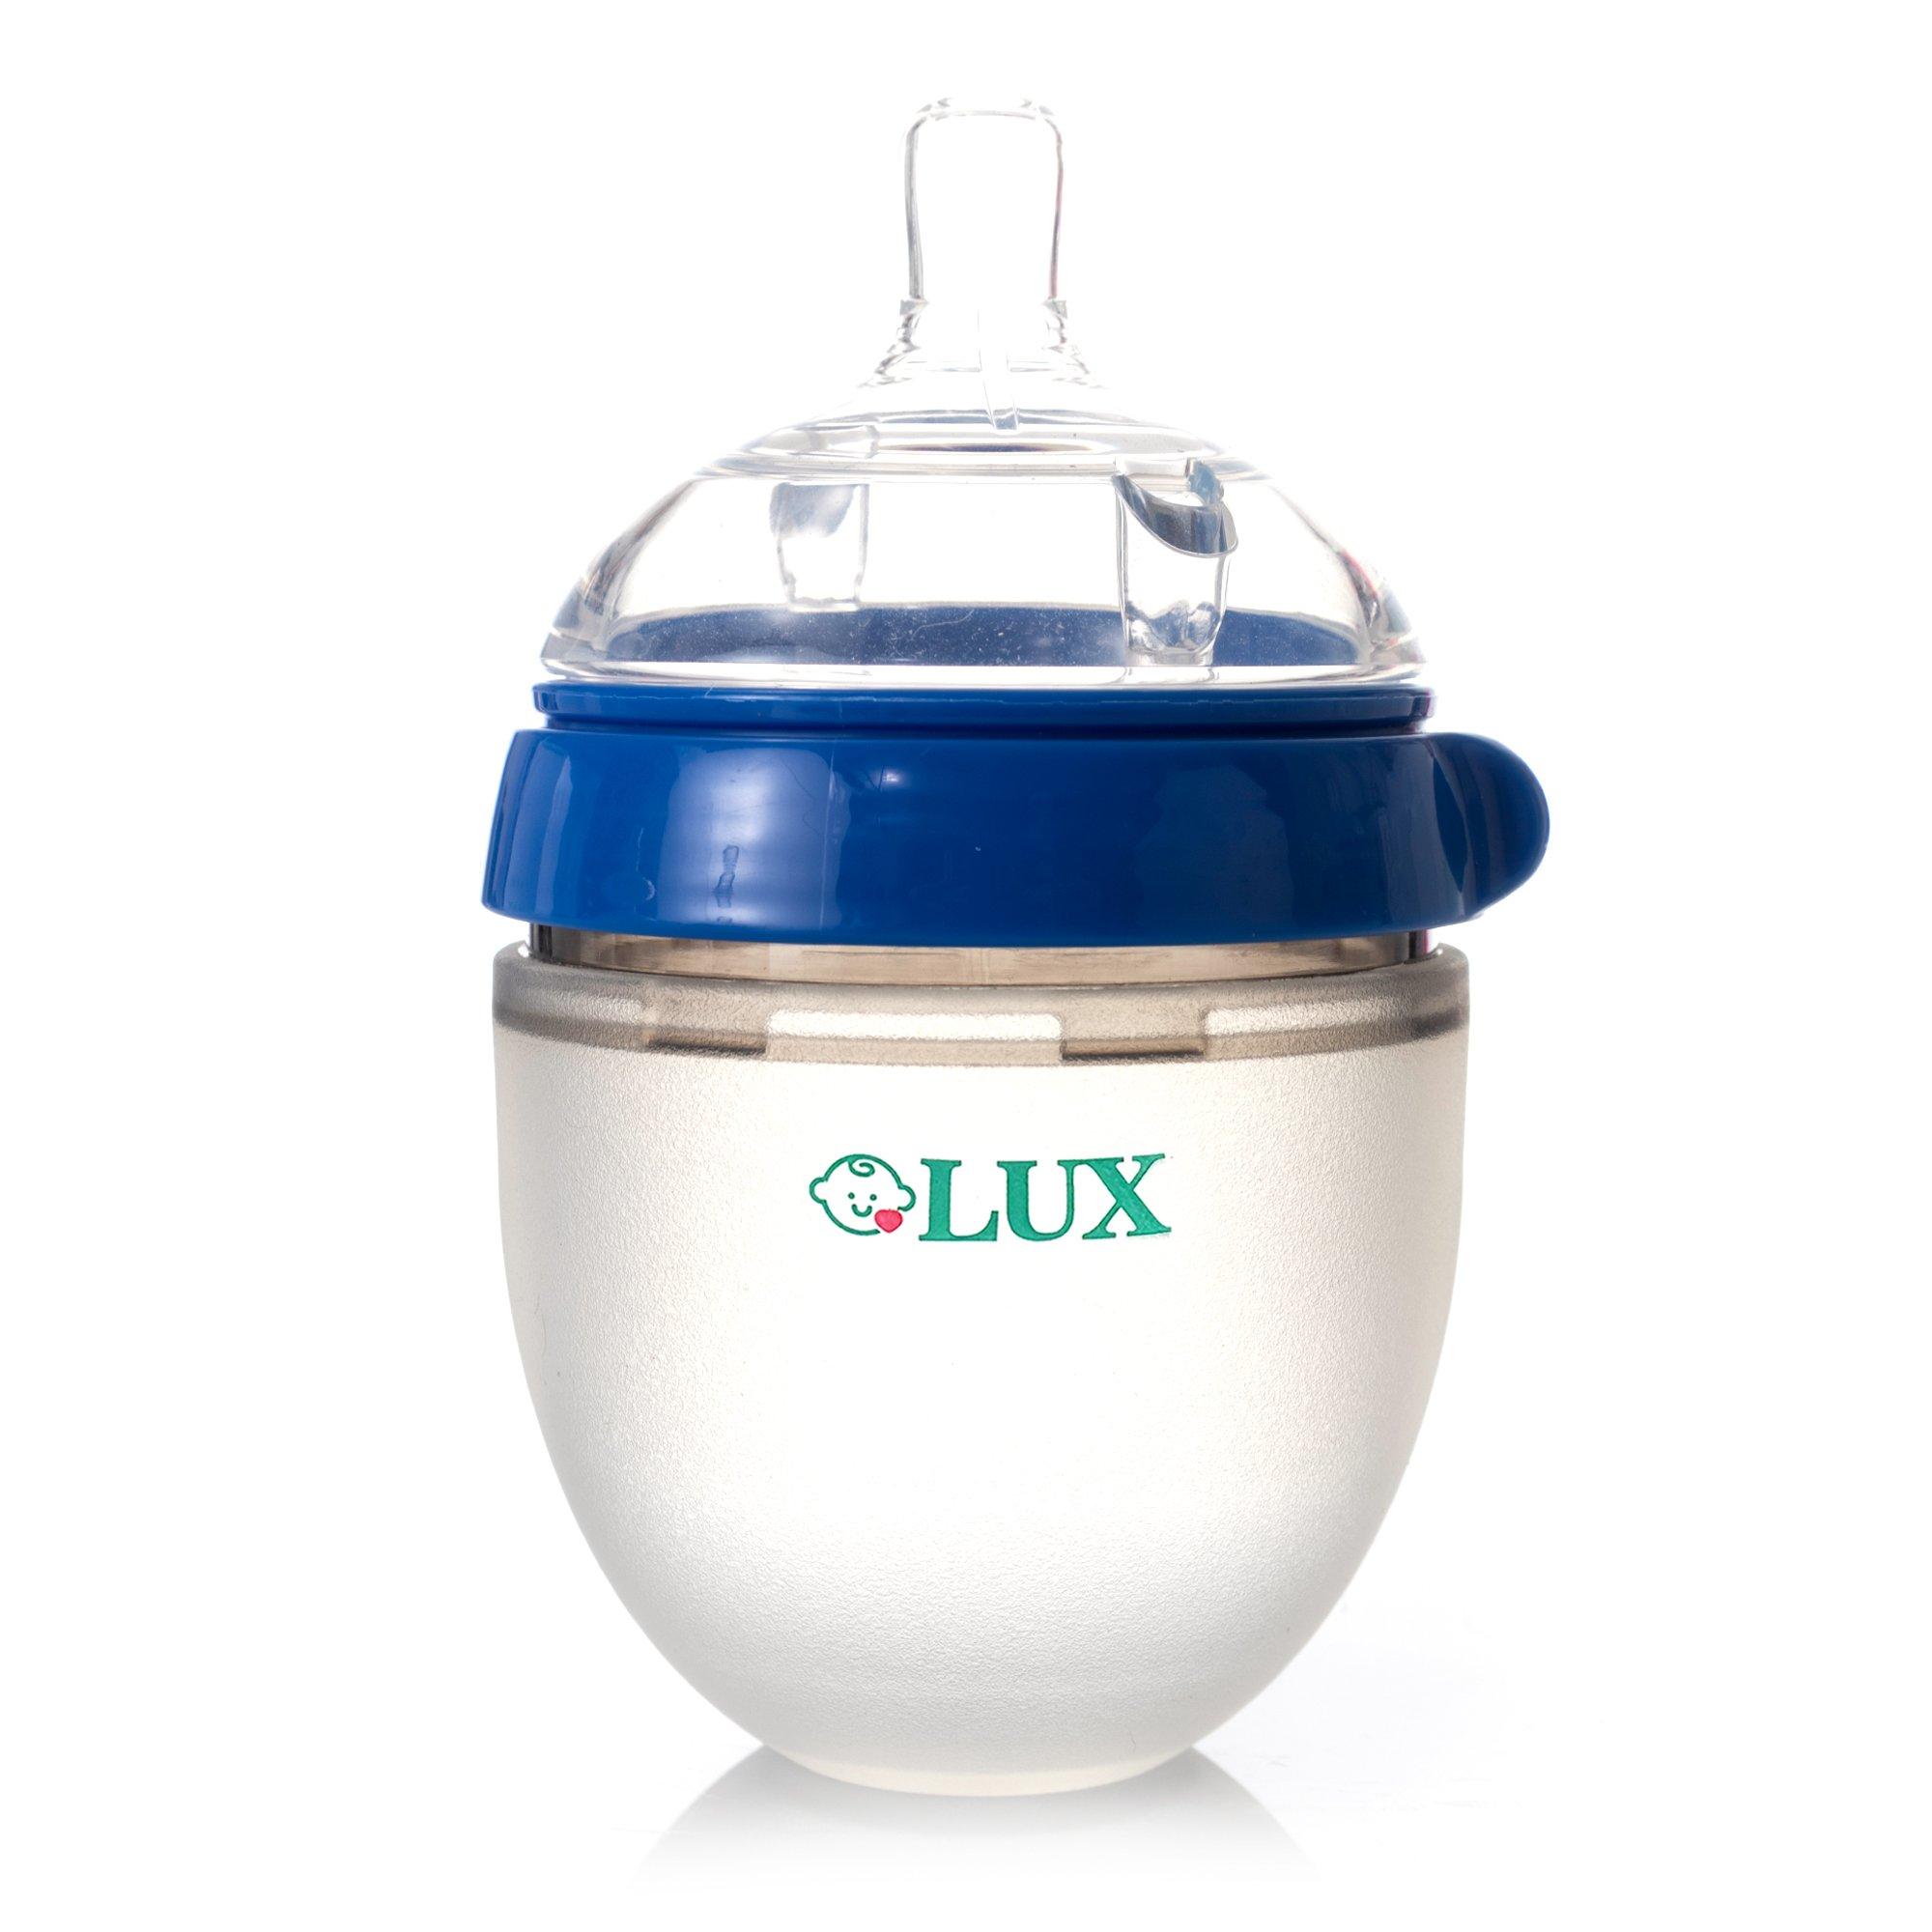 Baby Breastfeeding Nature Bottle by LUX – Slow Flow Newborn Feeding Bottle – BPA-Free Silicone – No Leak & No Waste Smart Design – Easy Transition – 5oz Slow Flow Nipple (Blue)